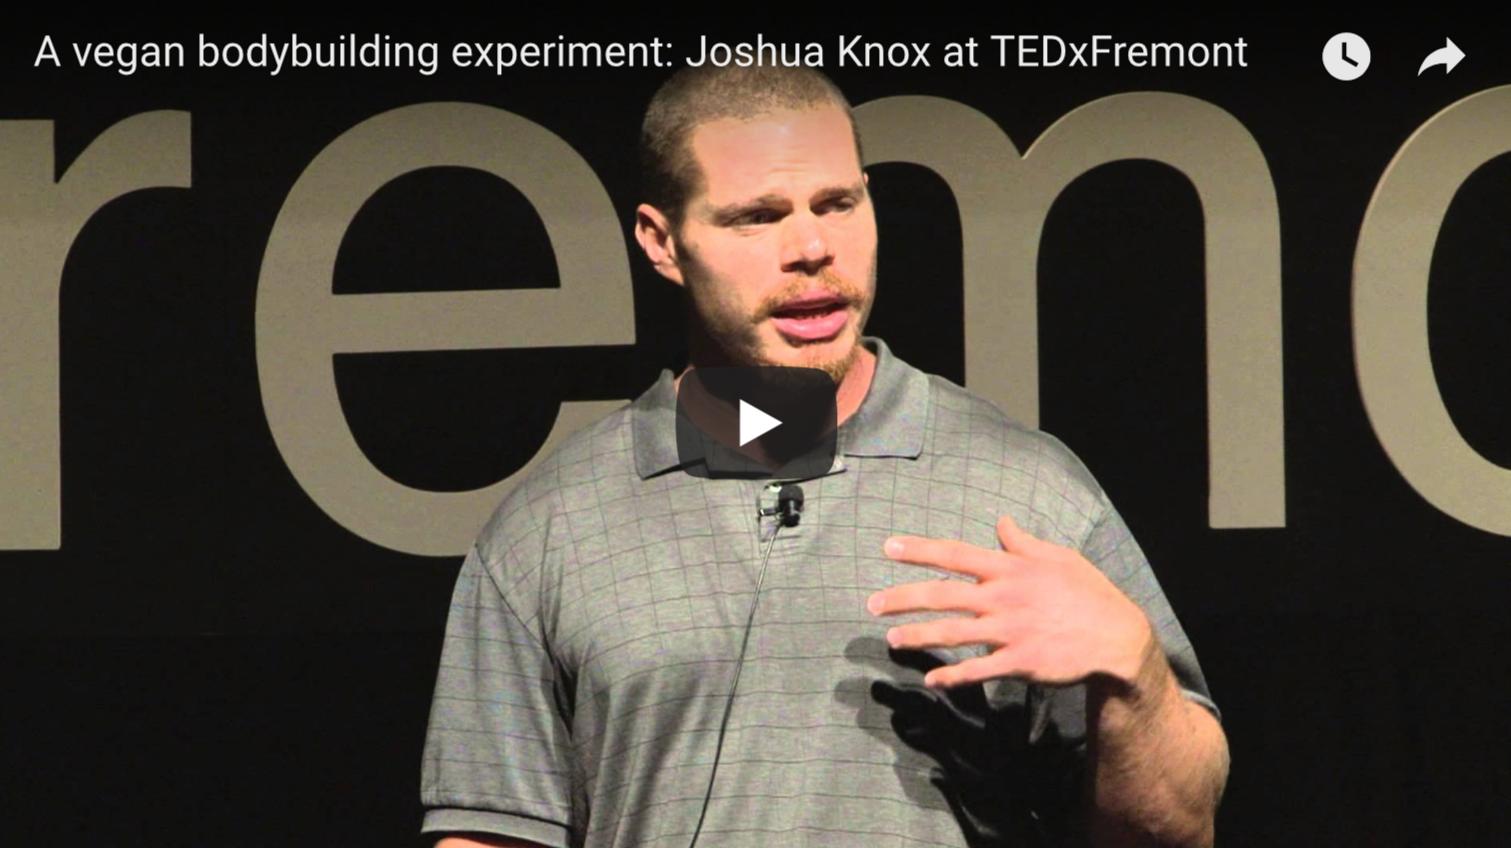 A vegan bodybuilding experiment: Joshua Knox at TEDxFremont | VeganFlix